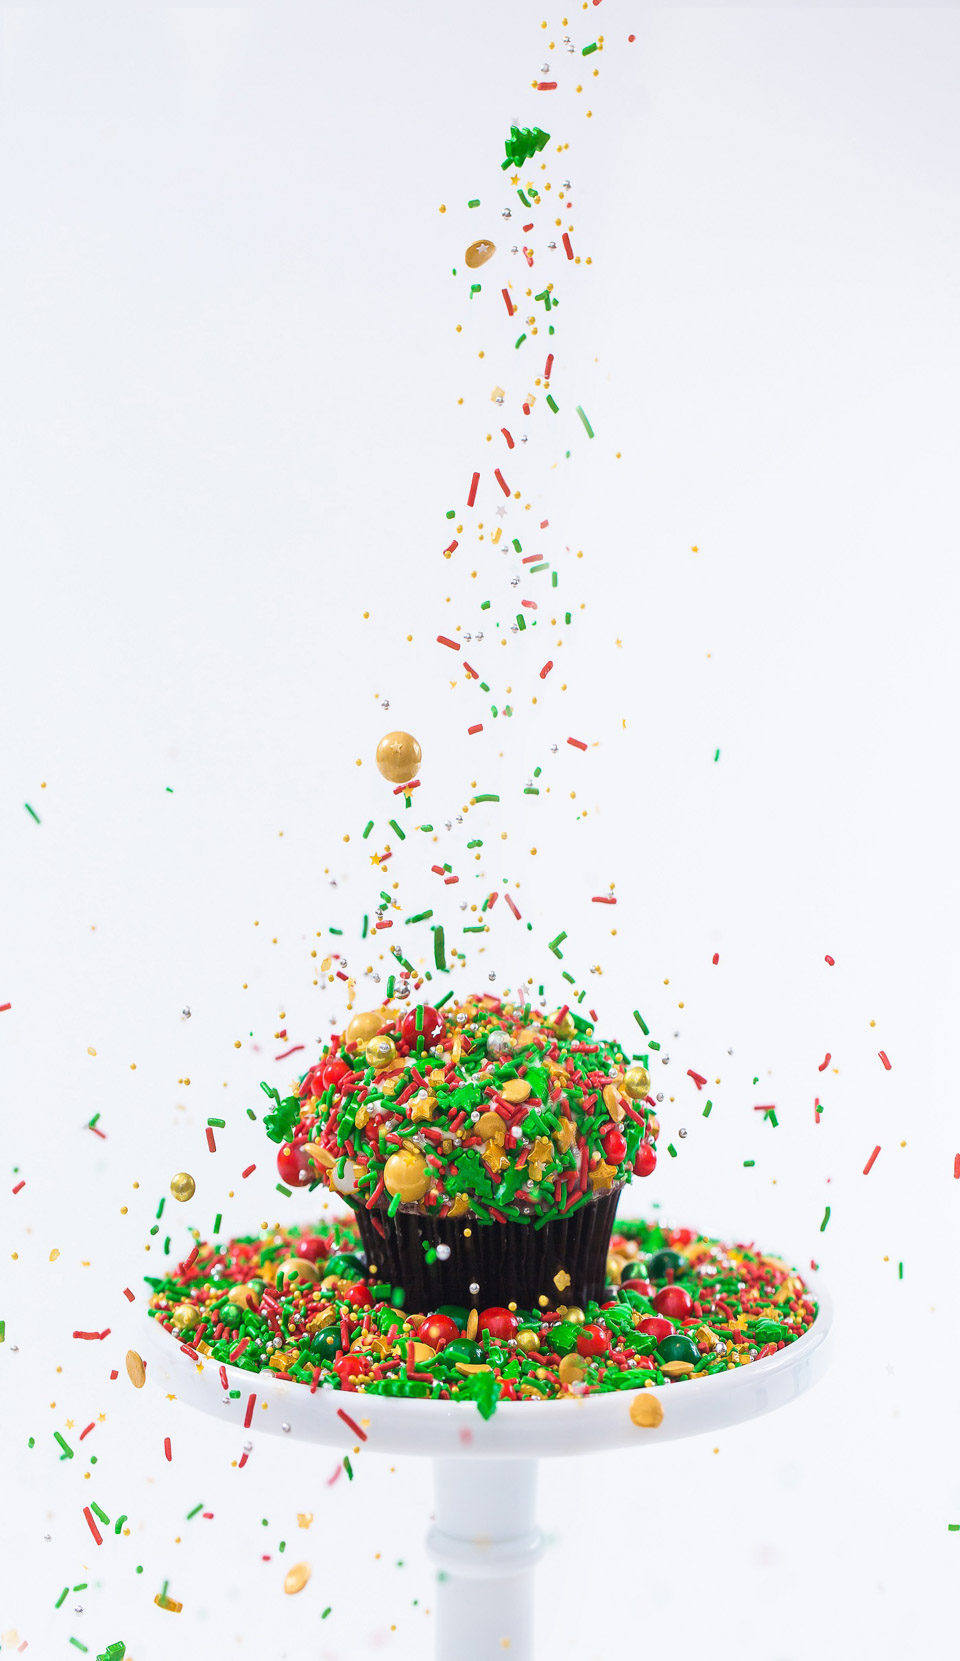 Sprinkles Cupcakes Holiday Box